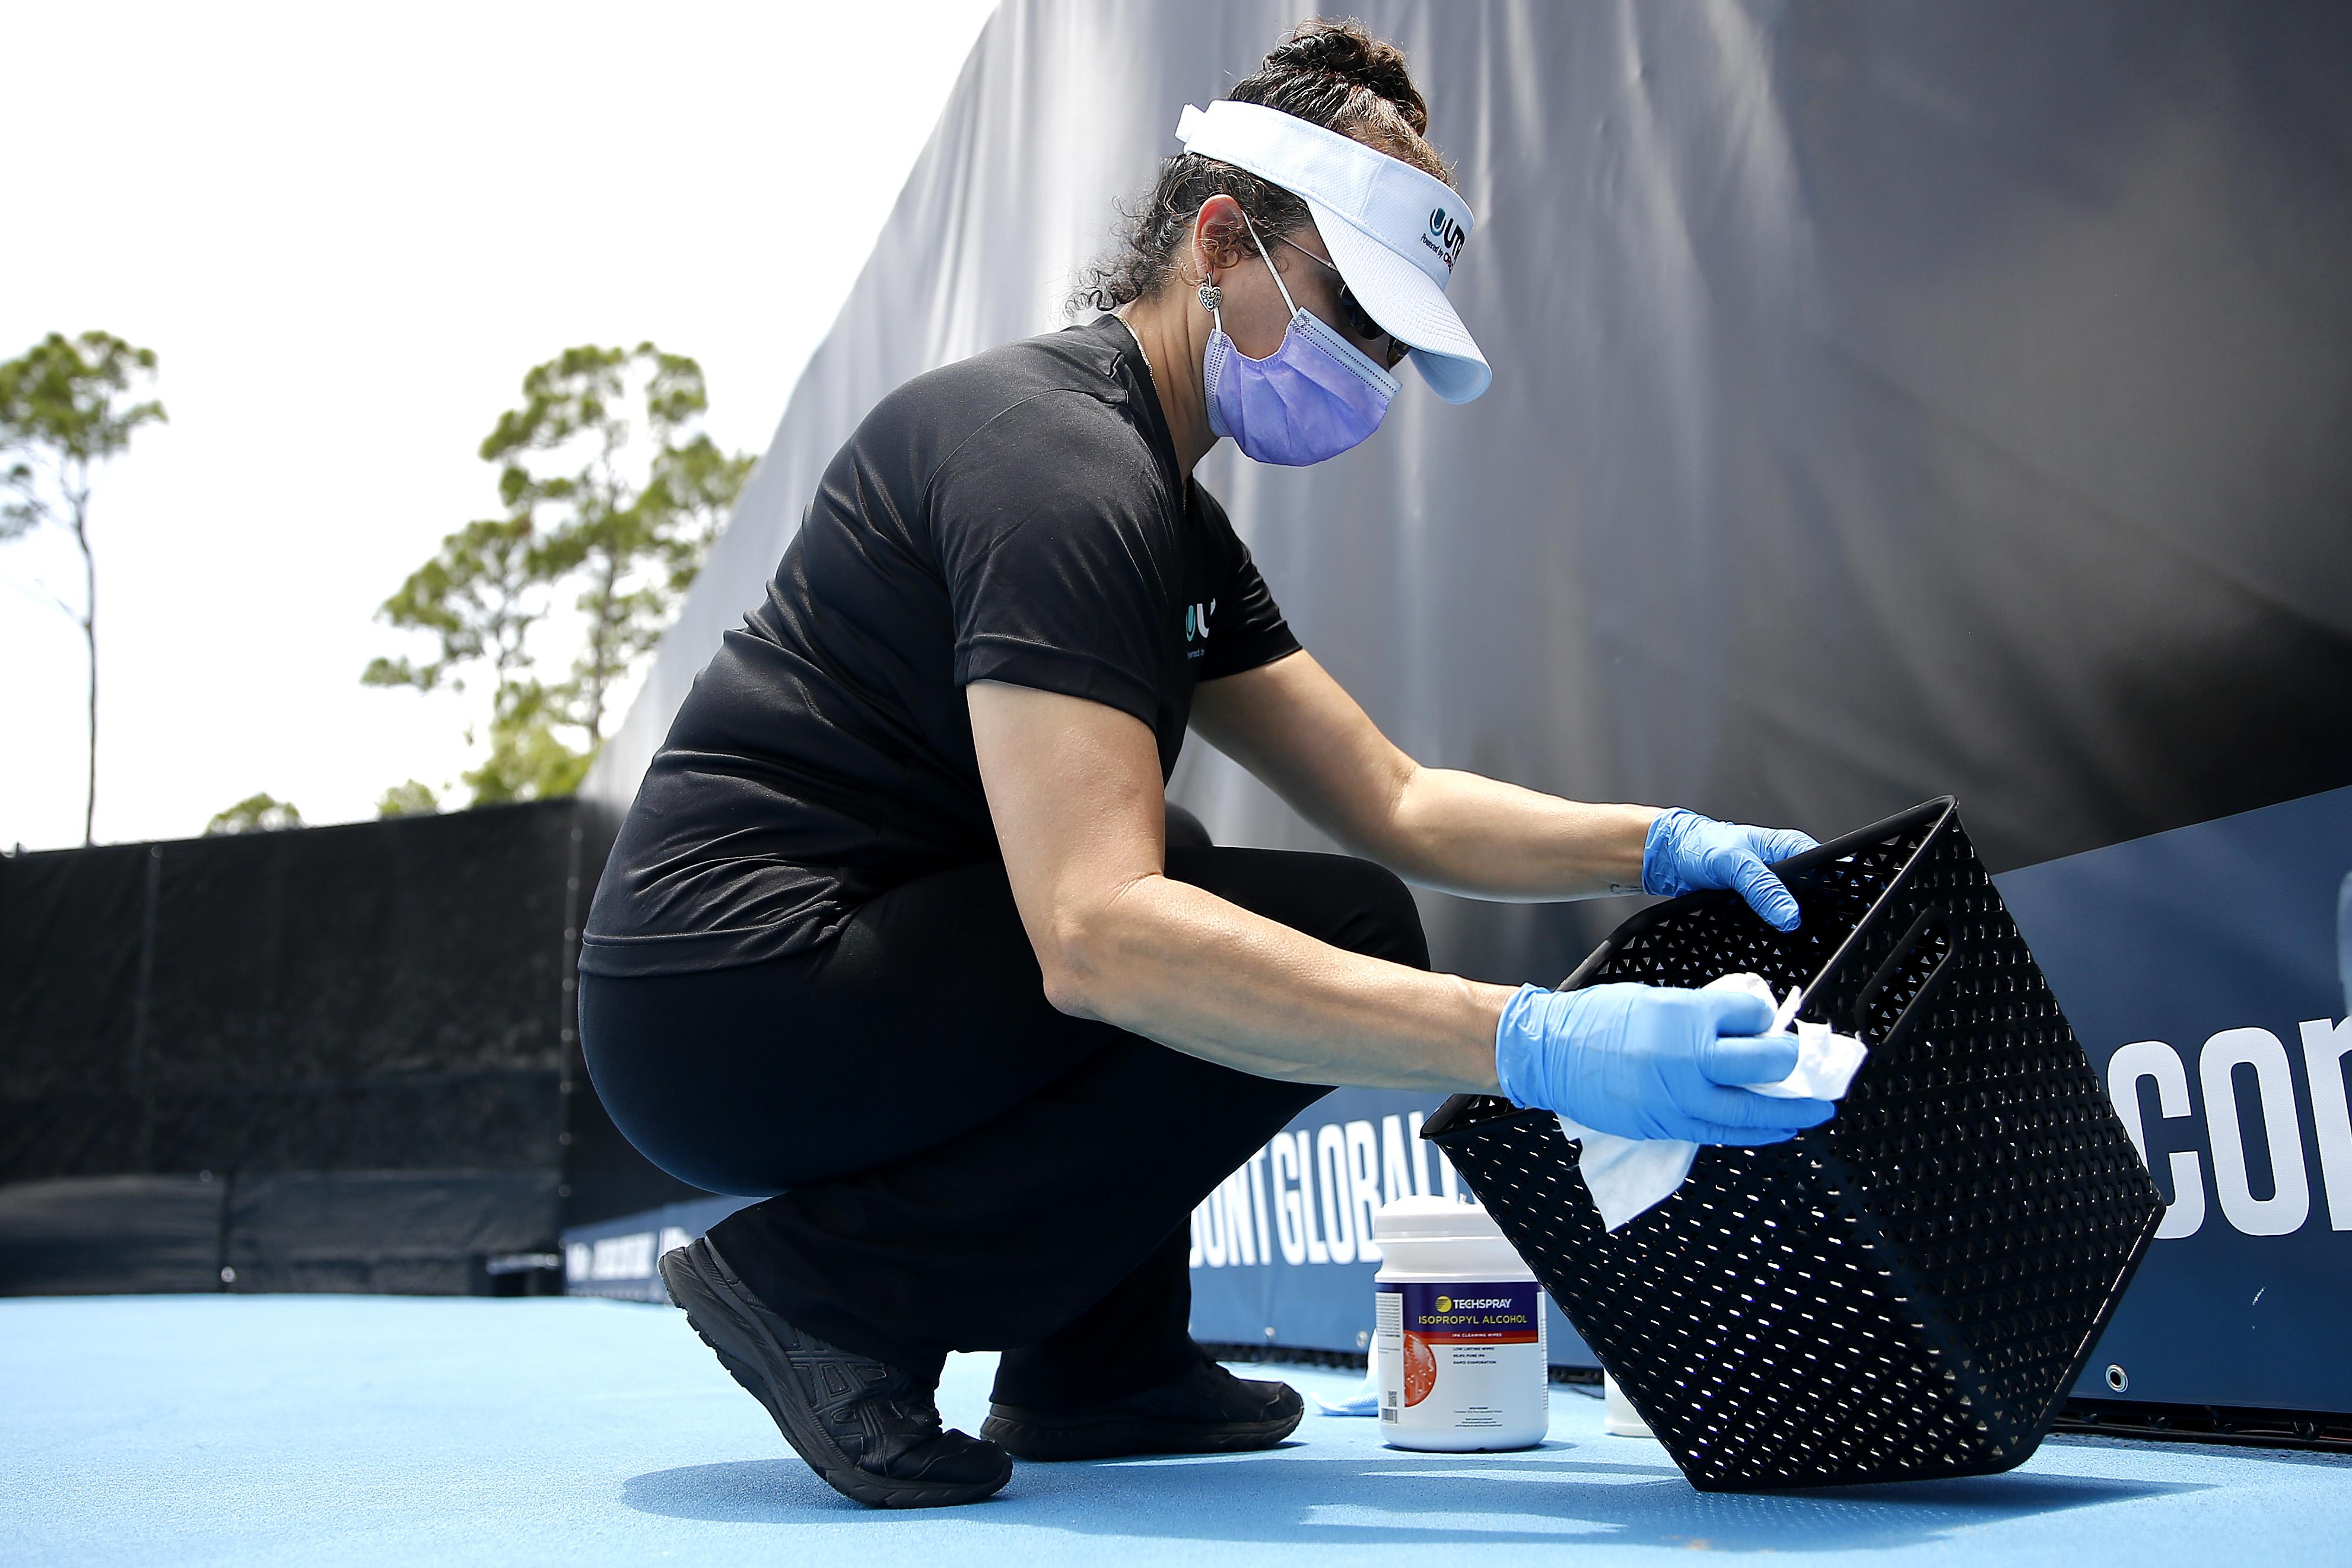 Player sanitising her basket after the match at UTR Pro Match Series. (Credits: Twitter/ UTR Pro)